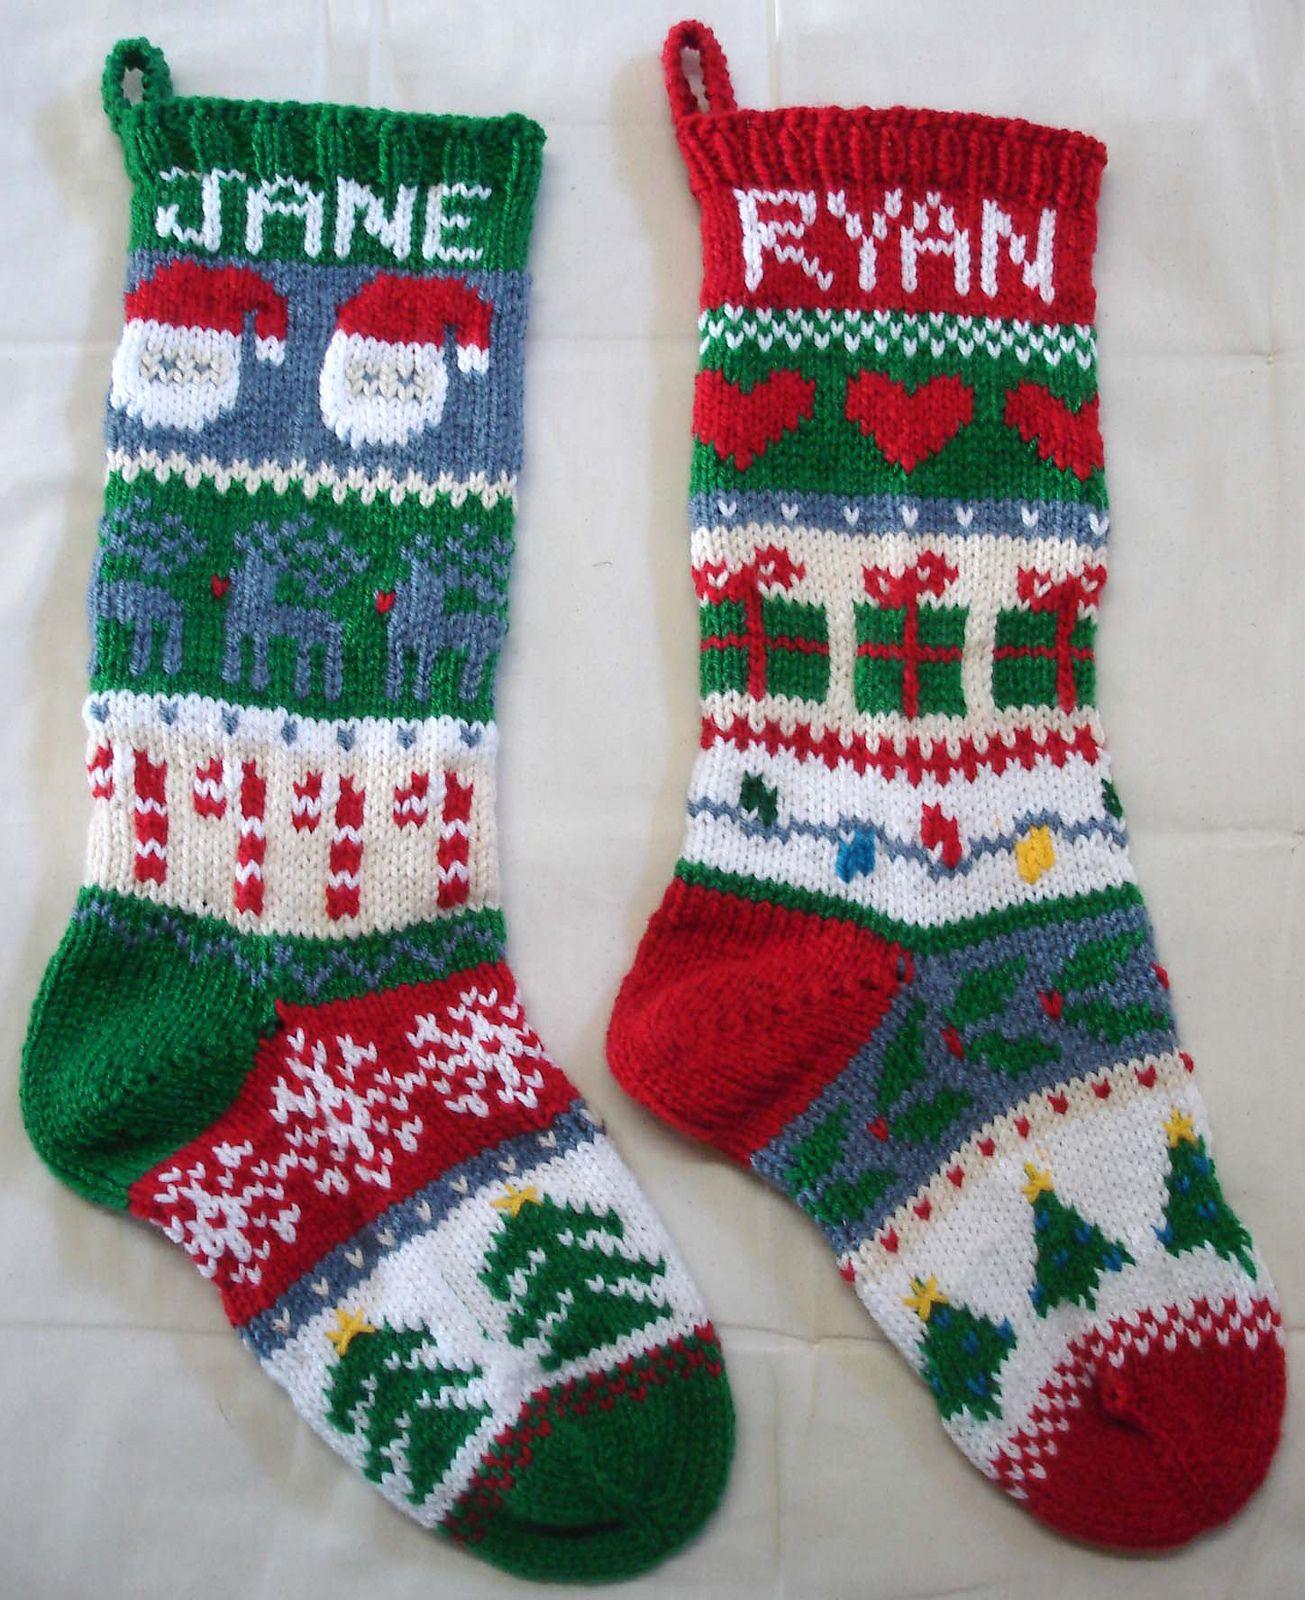 Ravelry: maggievanderstok's Christmas stockings   Knitted ...